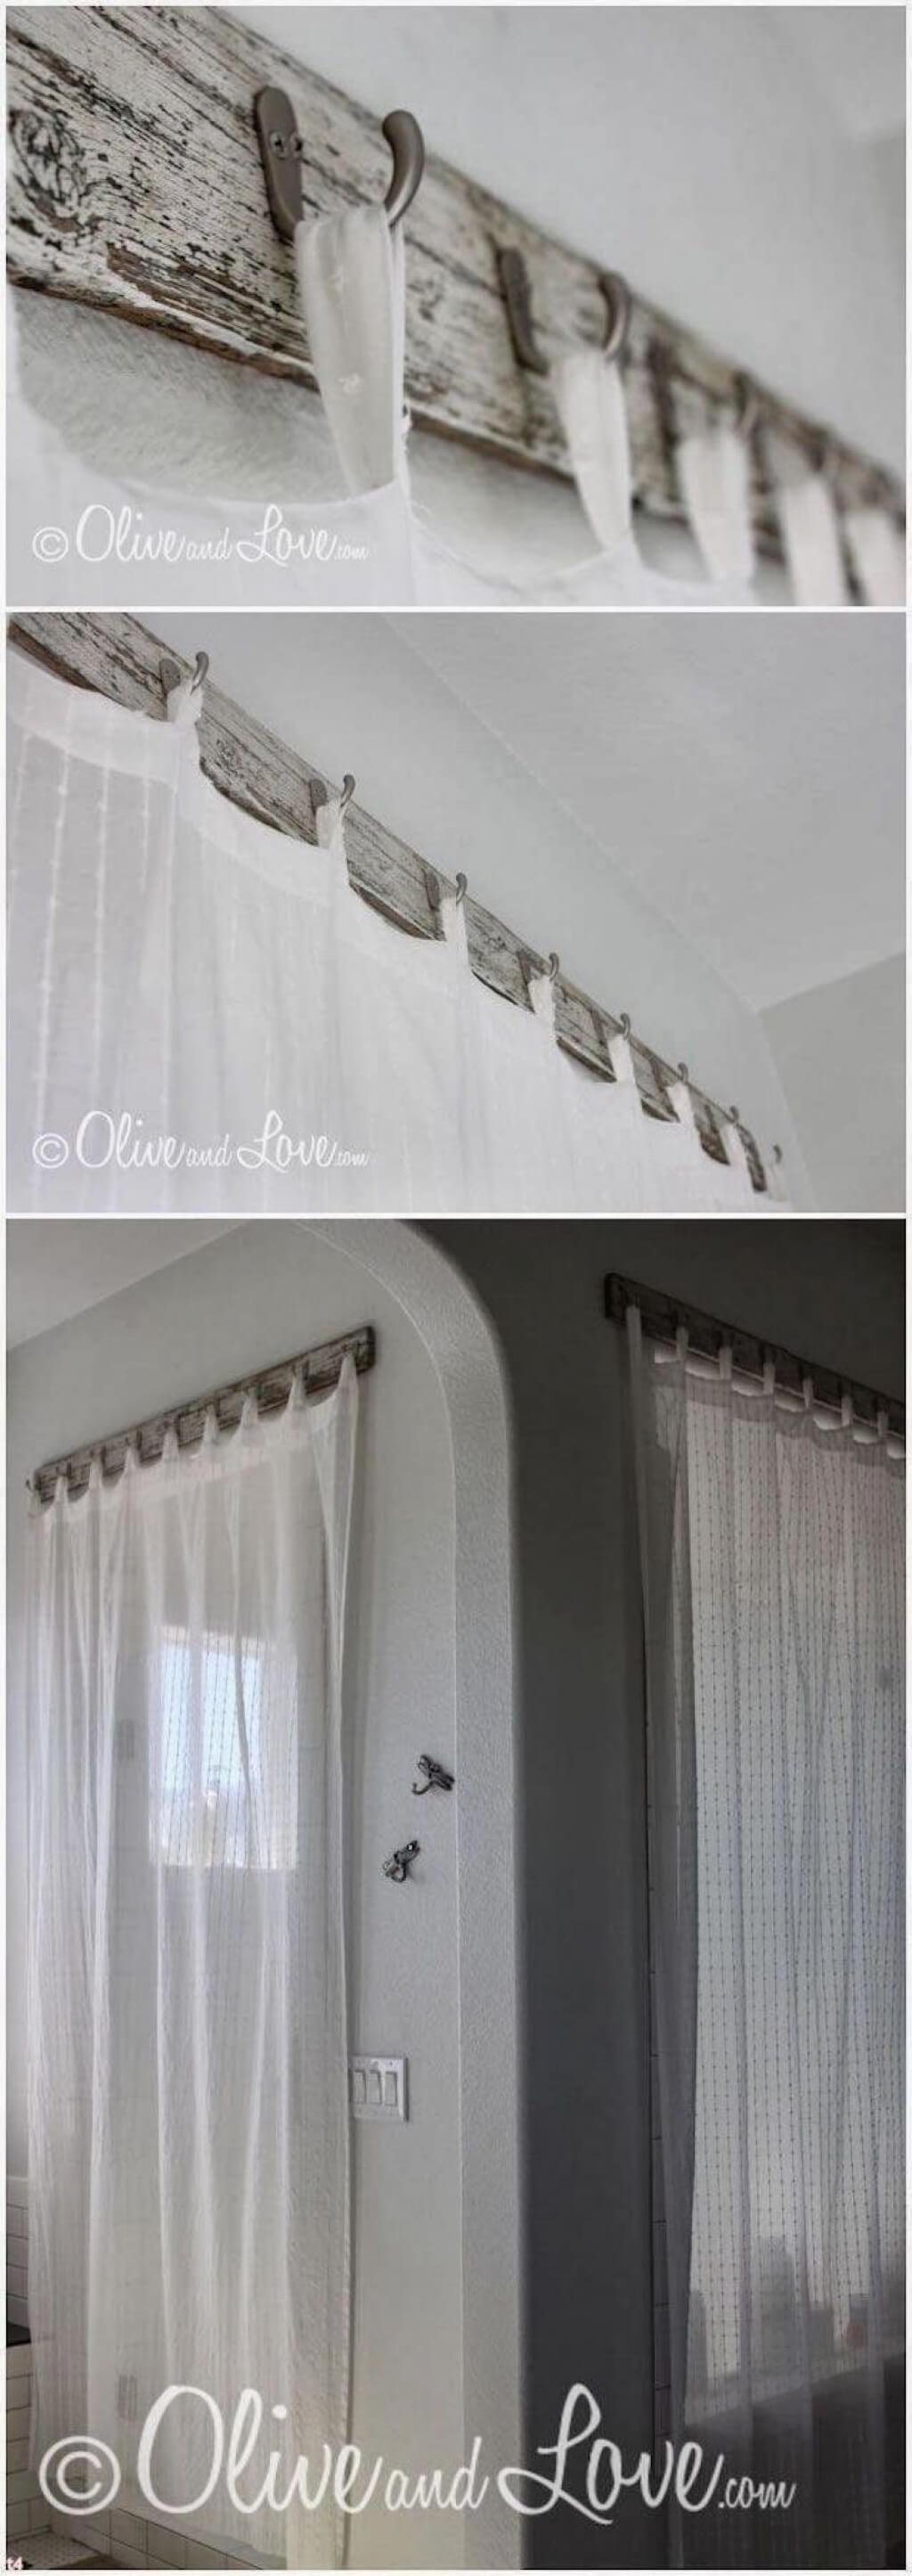 Hook, Line, And Sinker Curtain Beams